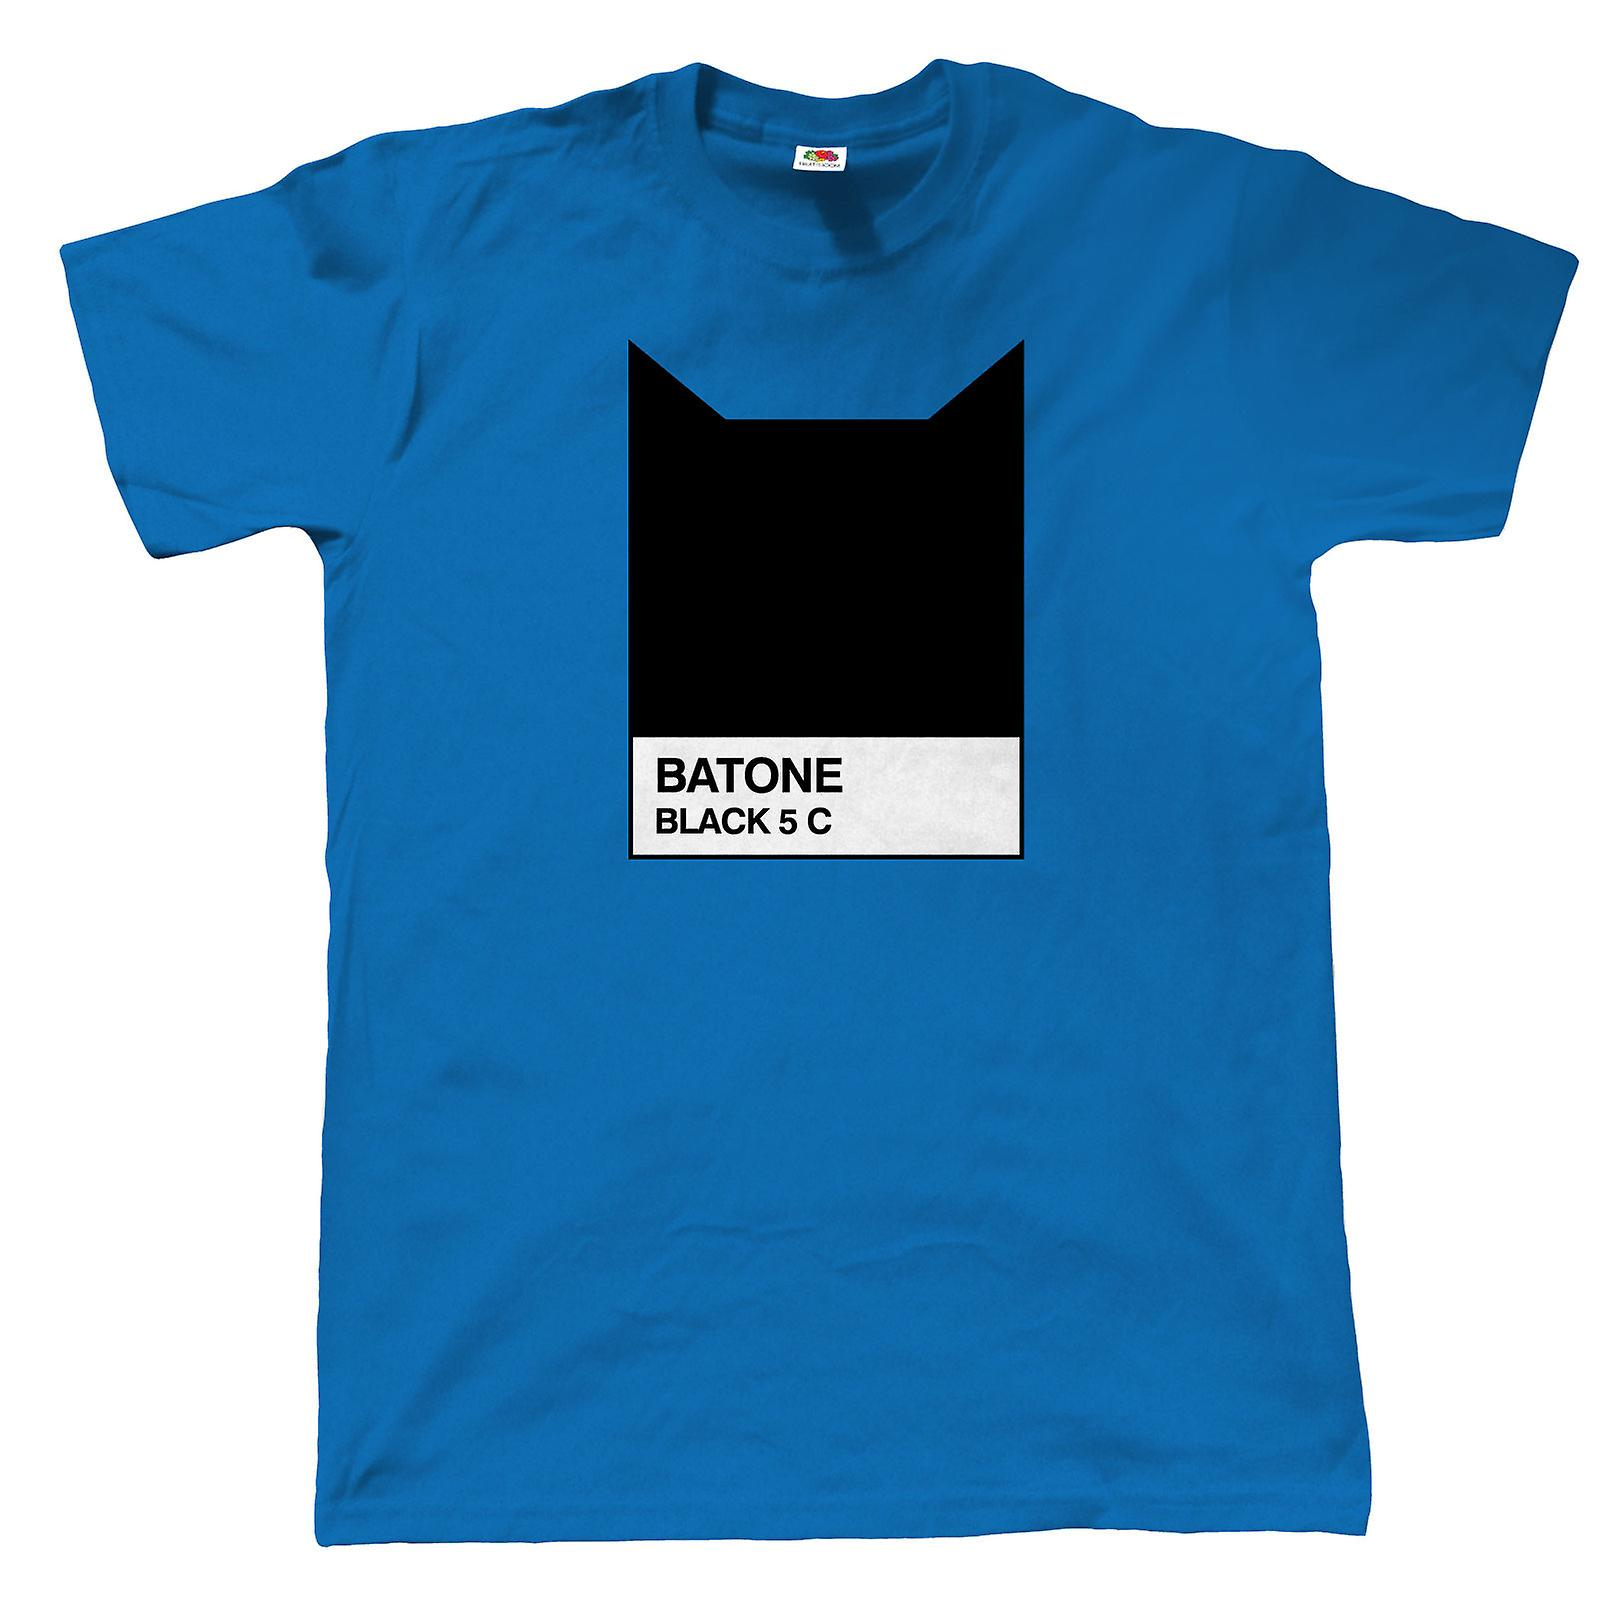 Hulk 39 s gym batone mens funny graphic designer t shirt s for Hulk fishing shirts